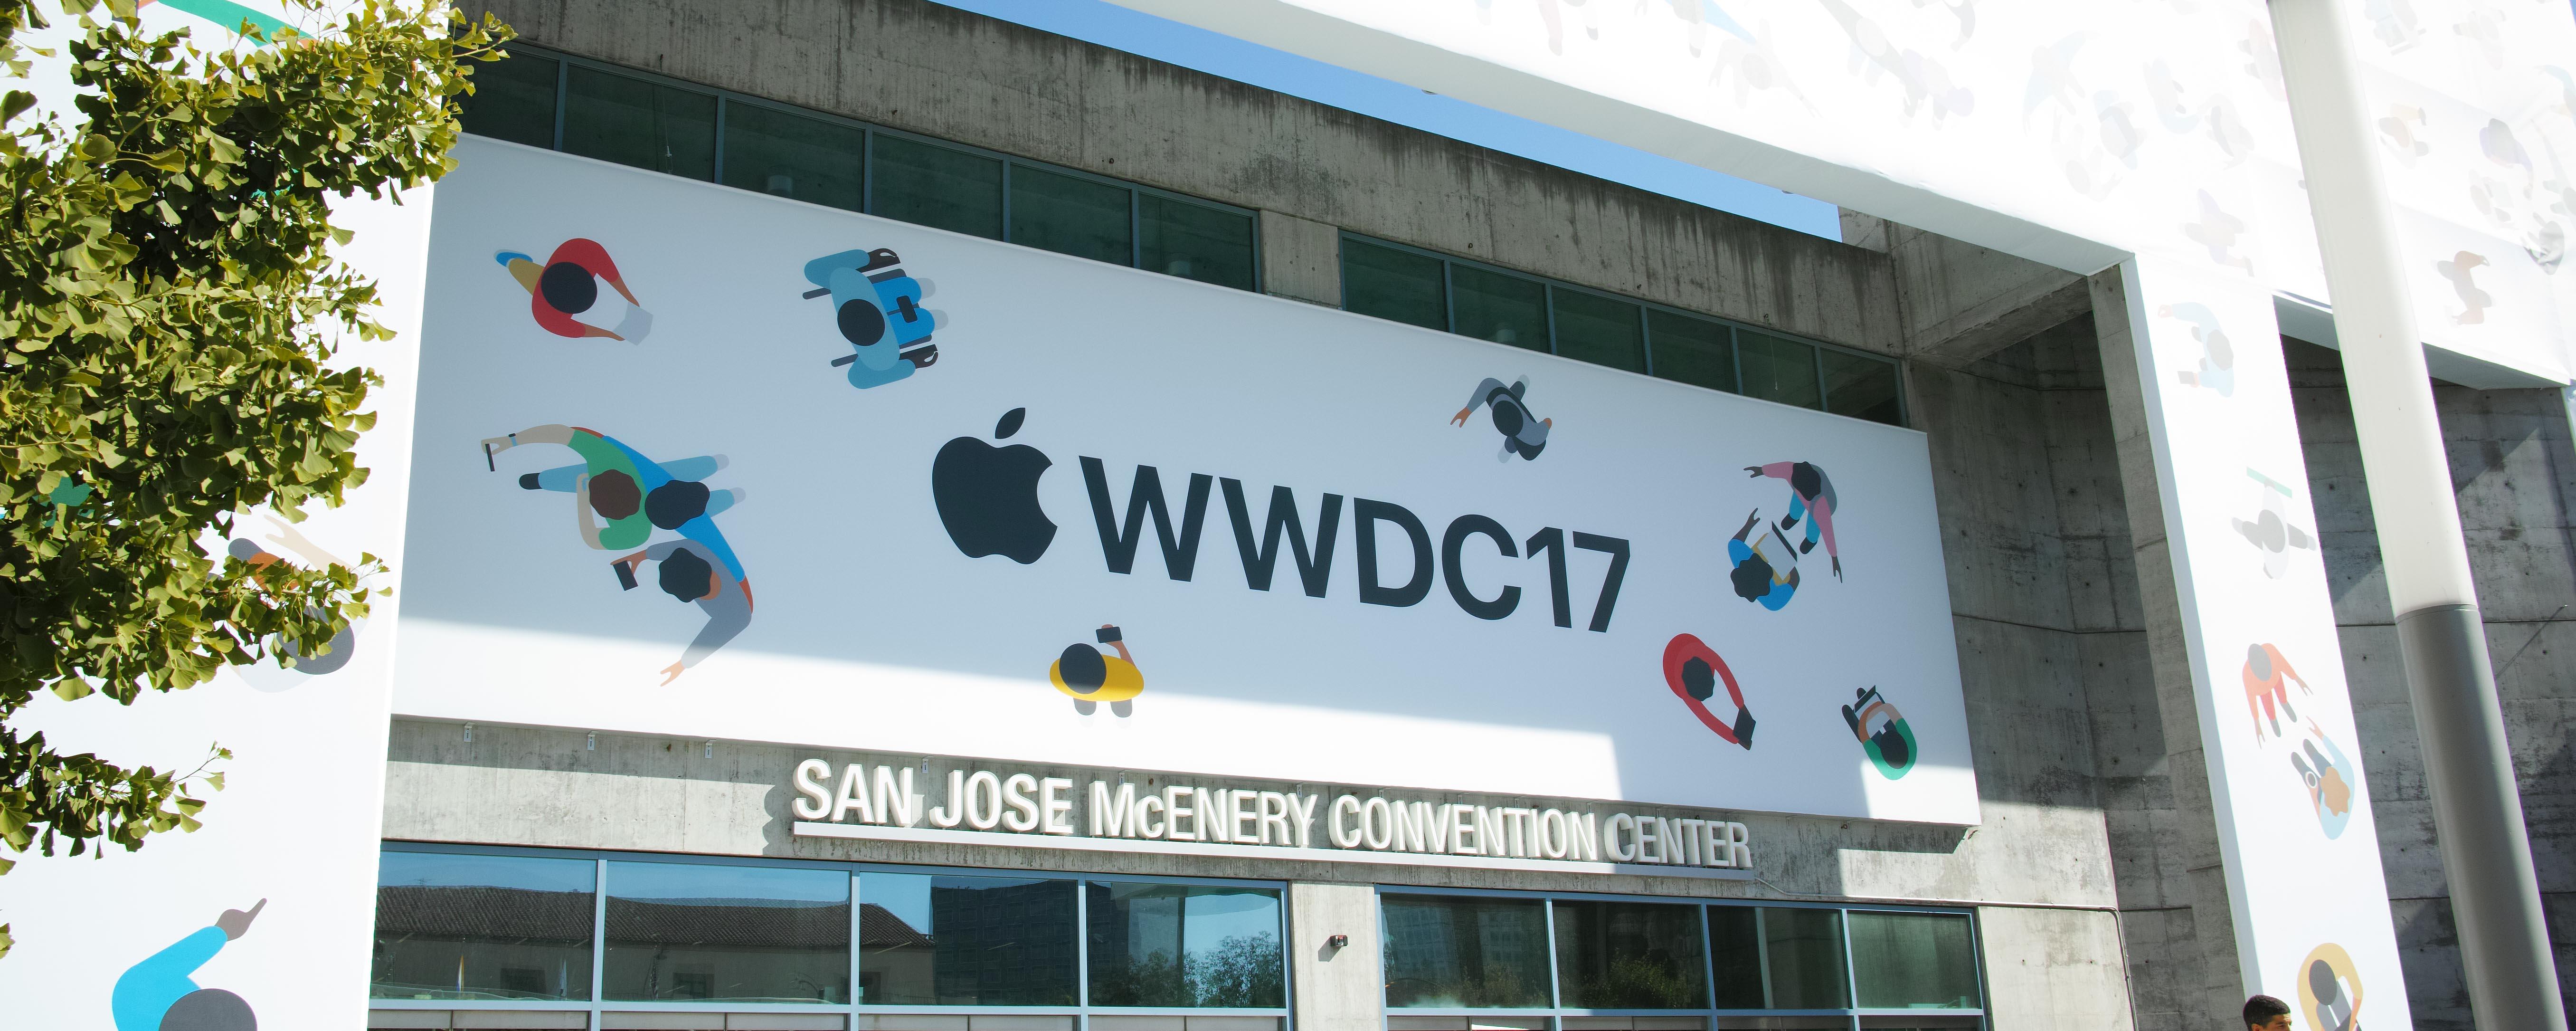 【WWDC2017】iOS開発におけるEmbedded Framework活用法 + ラボノススメ